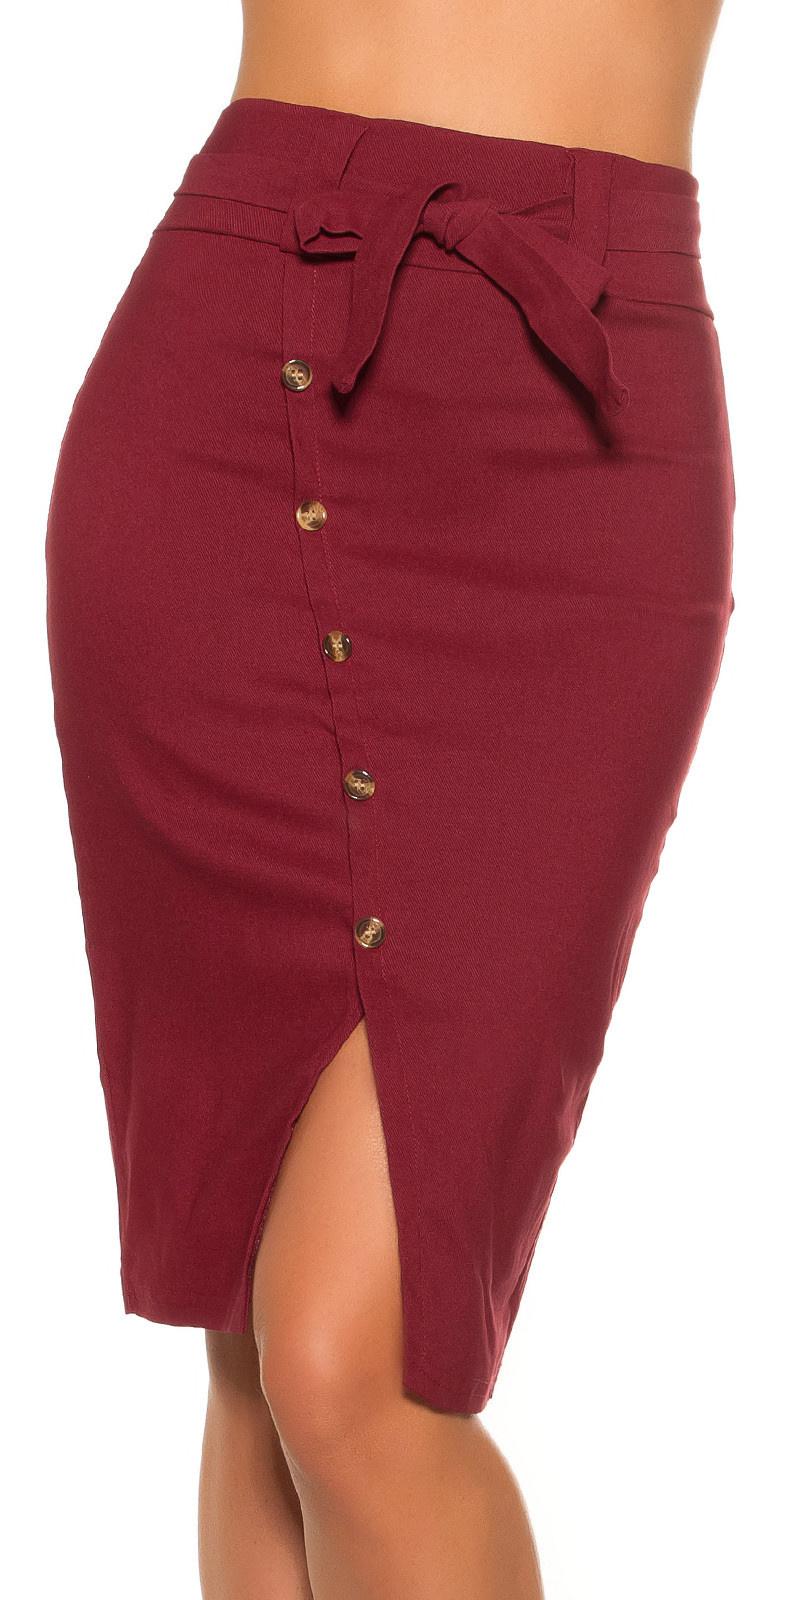 Sexy pencil-koker-hoge taille rok met riem bordeaux